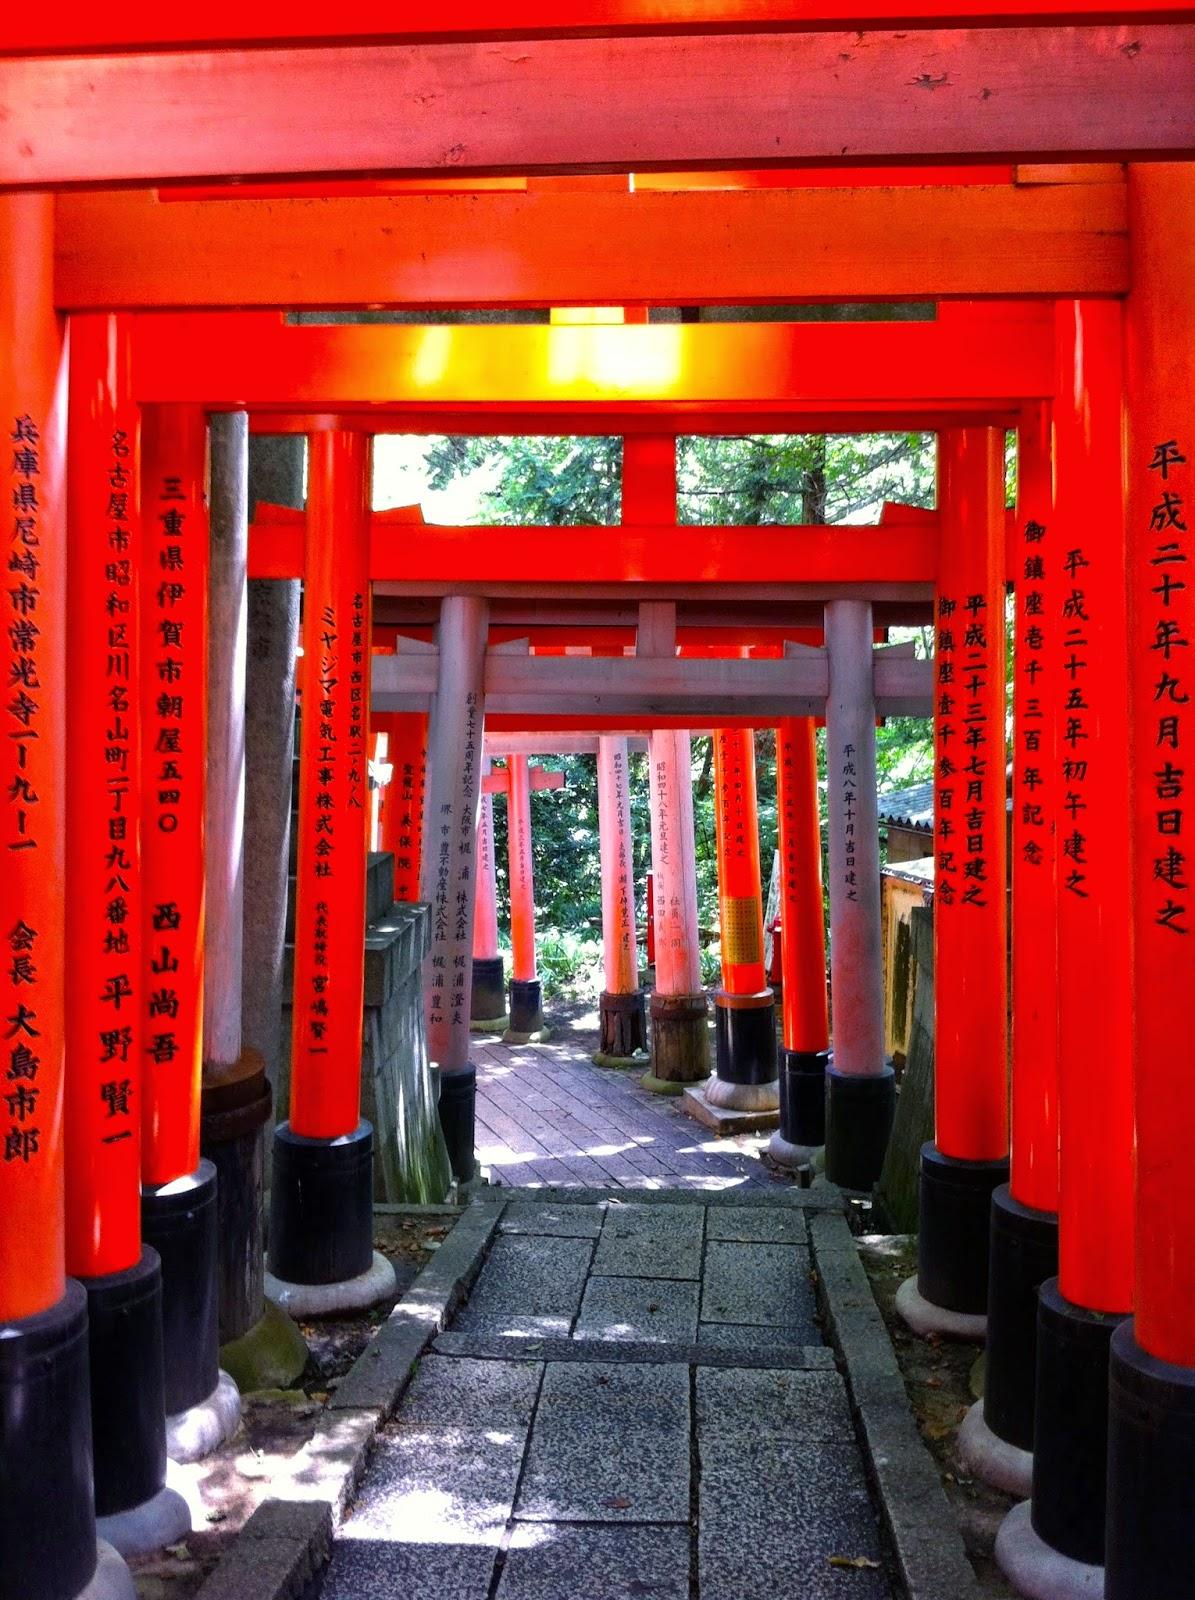 Giappone Kyoto Santuario Fushimi Inari Taisha